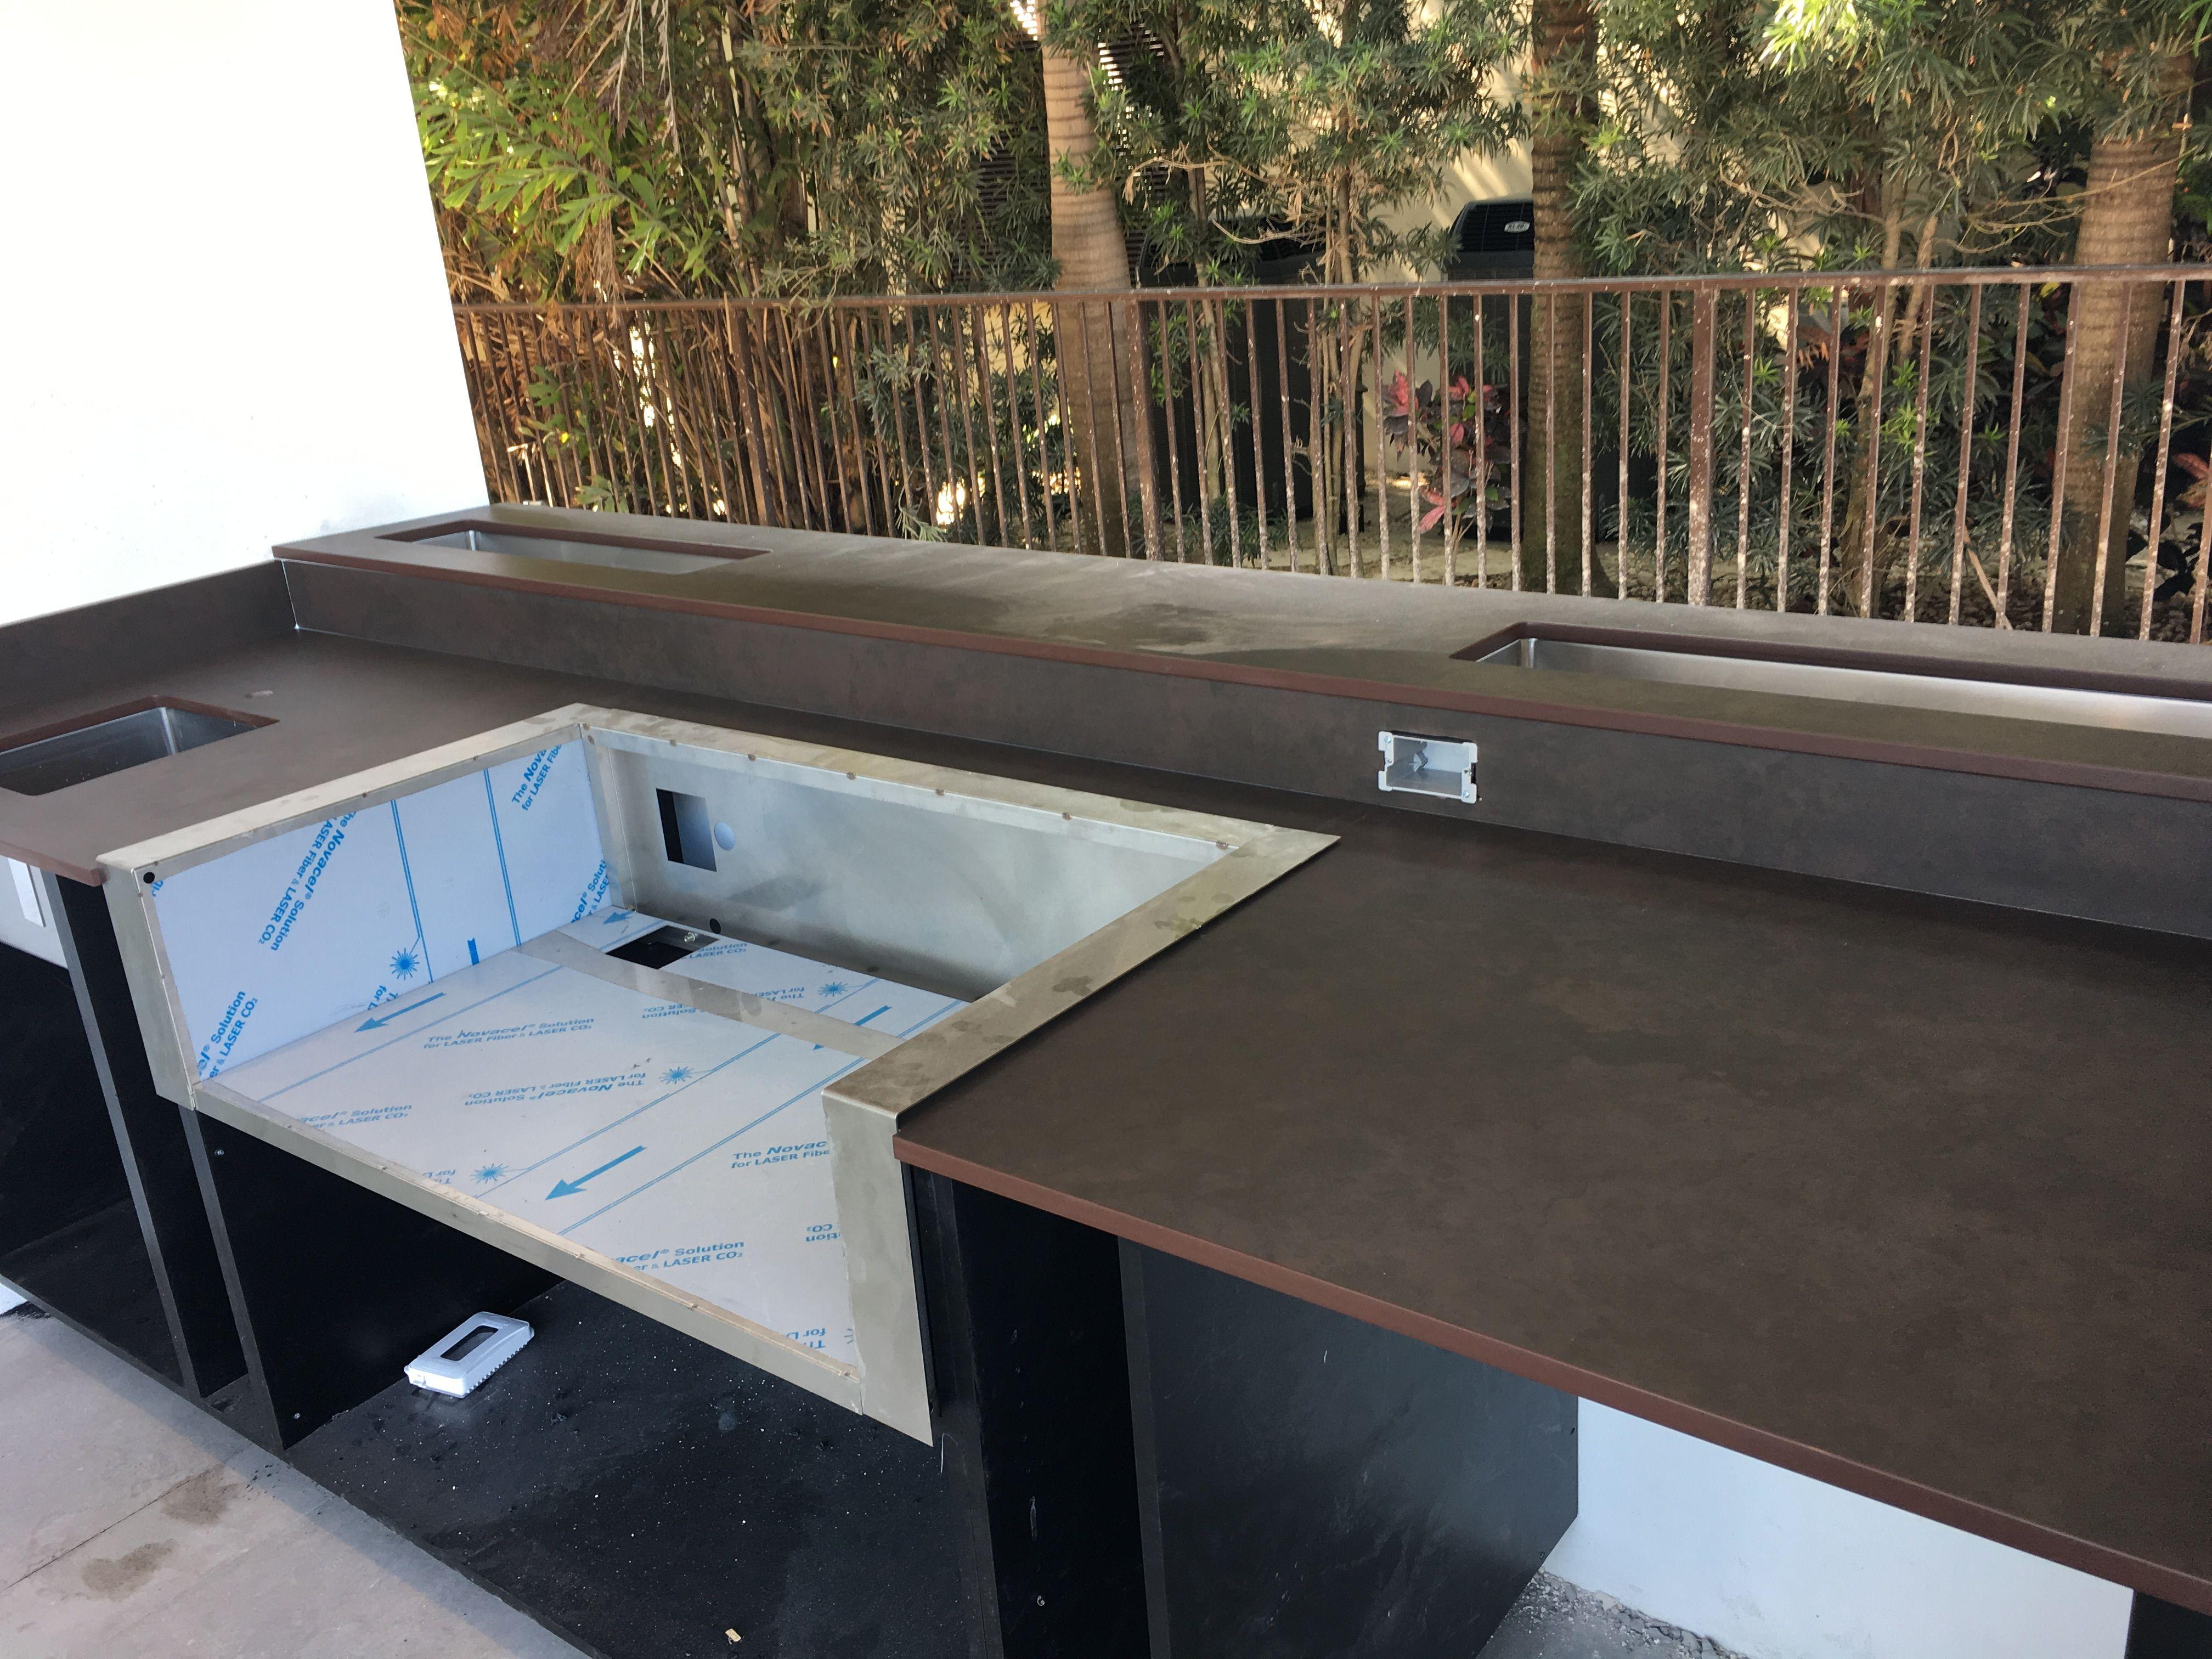 Dekton Keranium Dekton Countertops Outdoor Kitchen Dekton Withstands High Temperatures Without Burning Scorching Or C Quartz Countertops Dekton Countertops